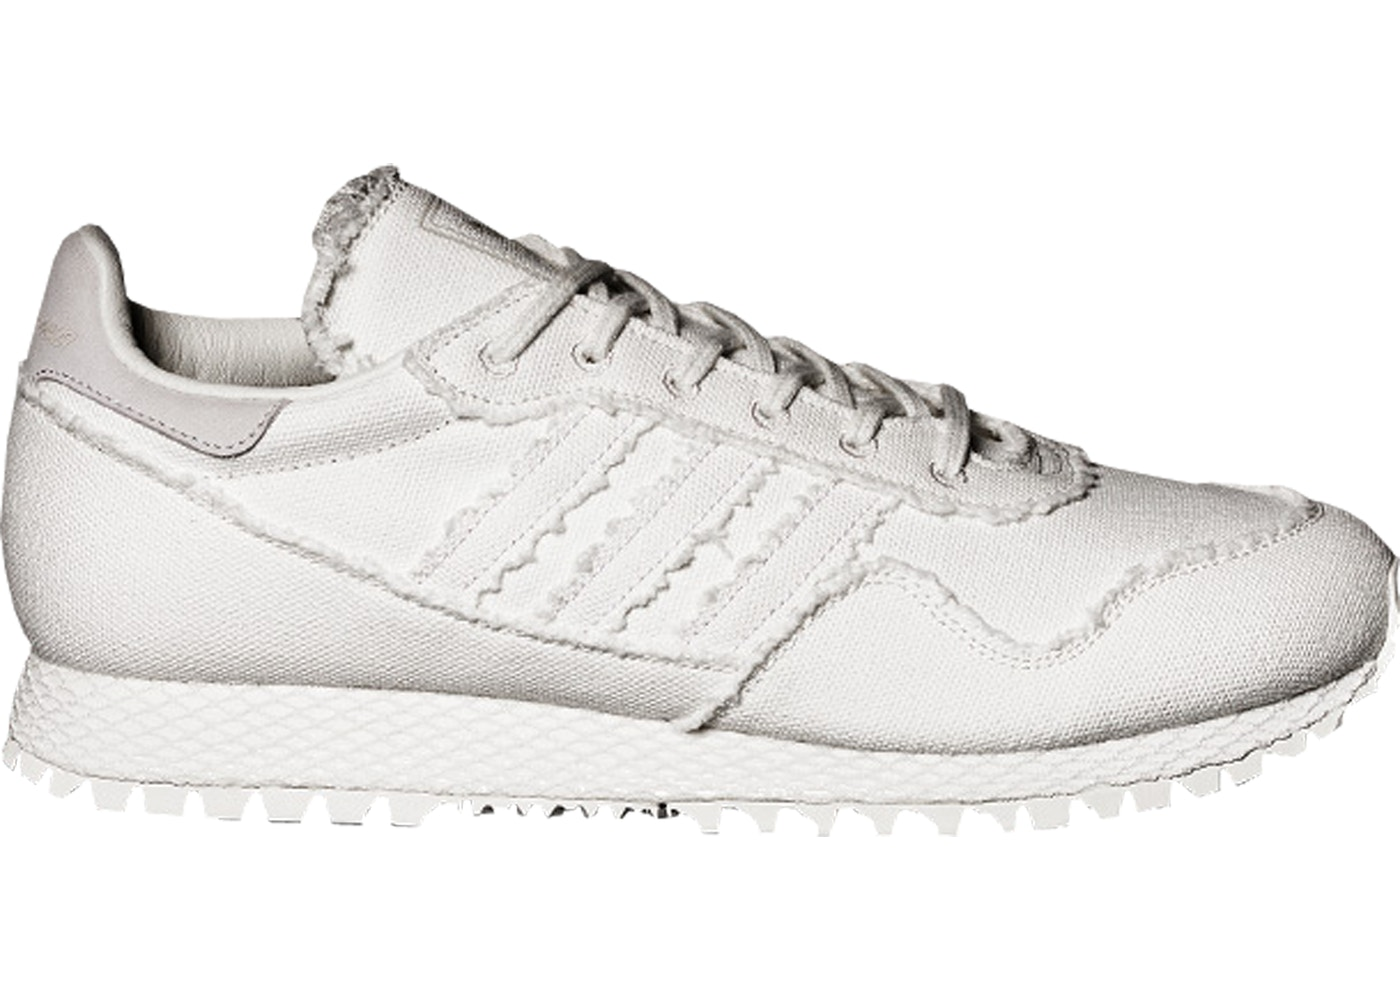 new styles 7234f 5d42a adidas New York Daniel Arsham - CM7193